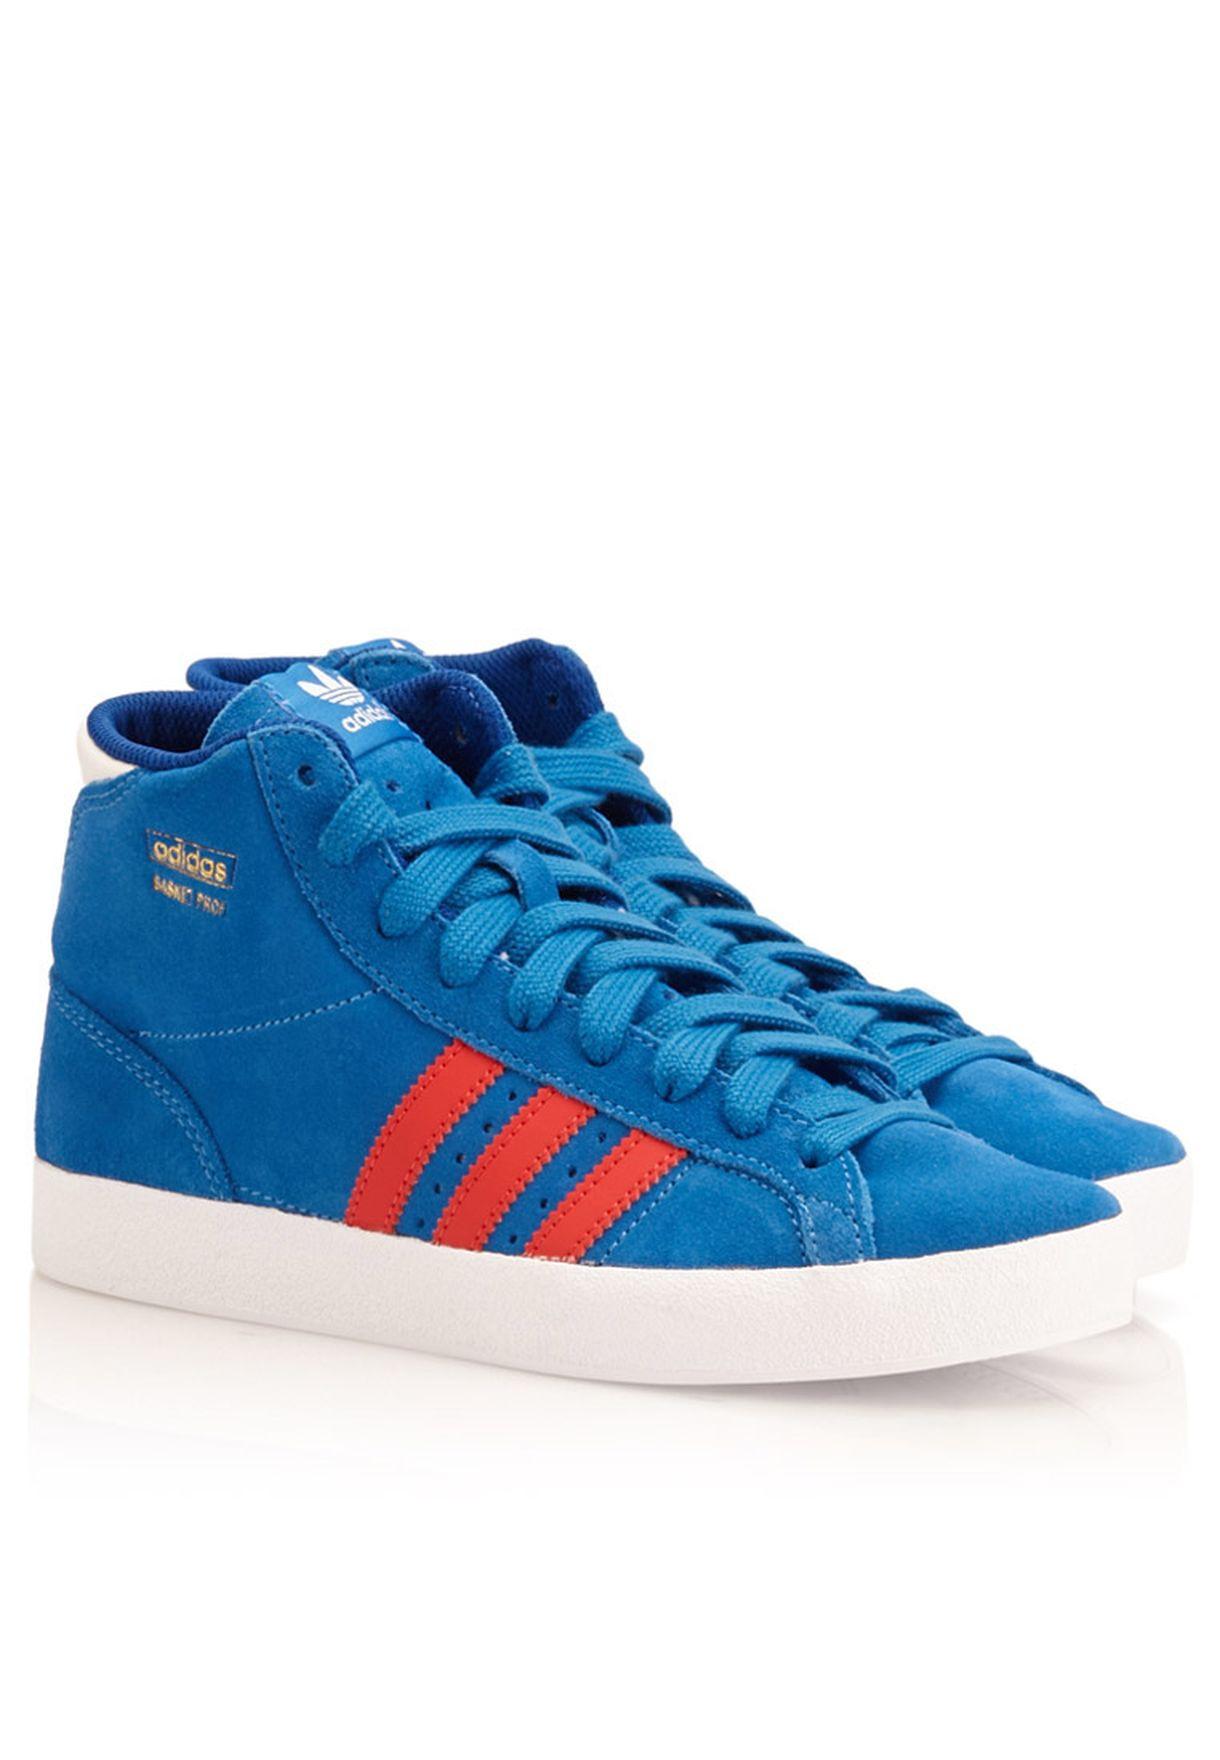 timeless design 72a74 9ddbb Shop adidas Originals blue Basket Profi M25180 for Kids in Qatar -  AD478SH93RIC